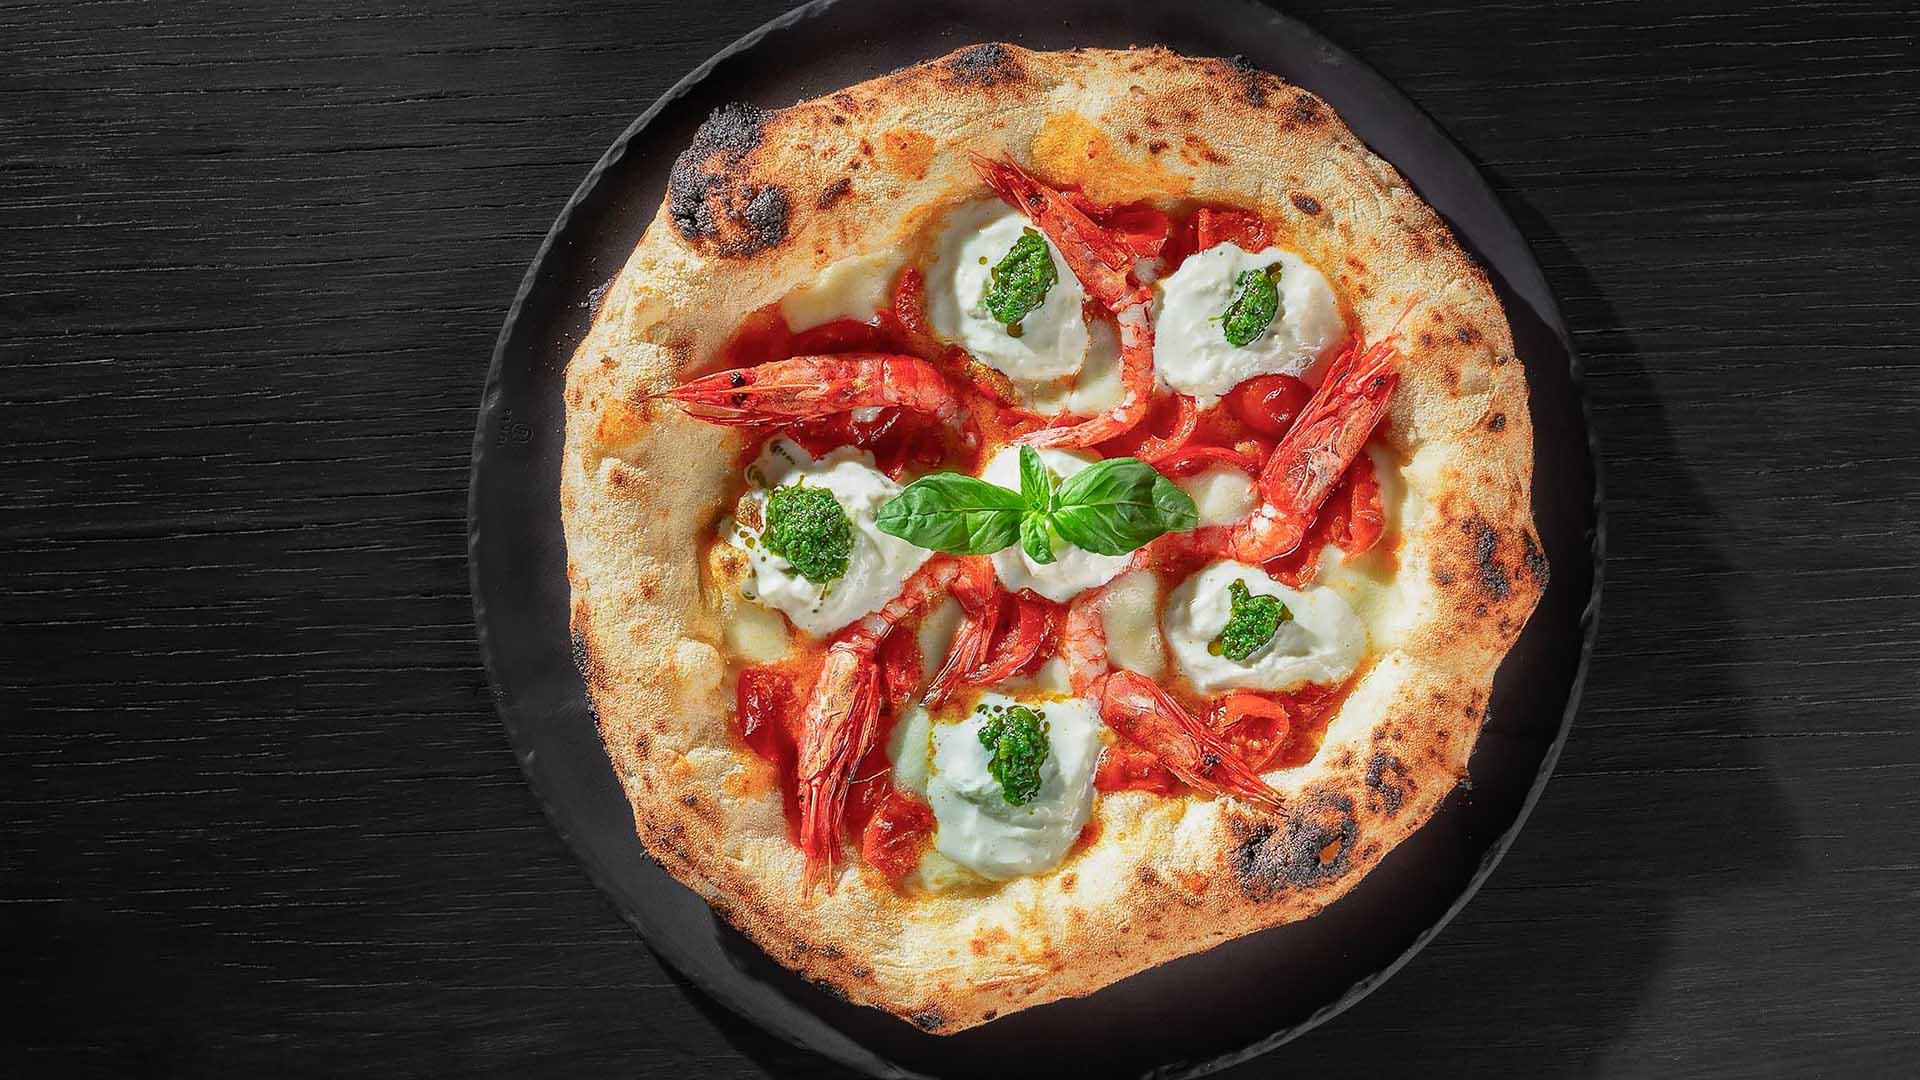 fotografo-food-pizza-ristoranti-pp